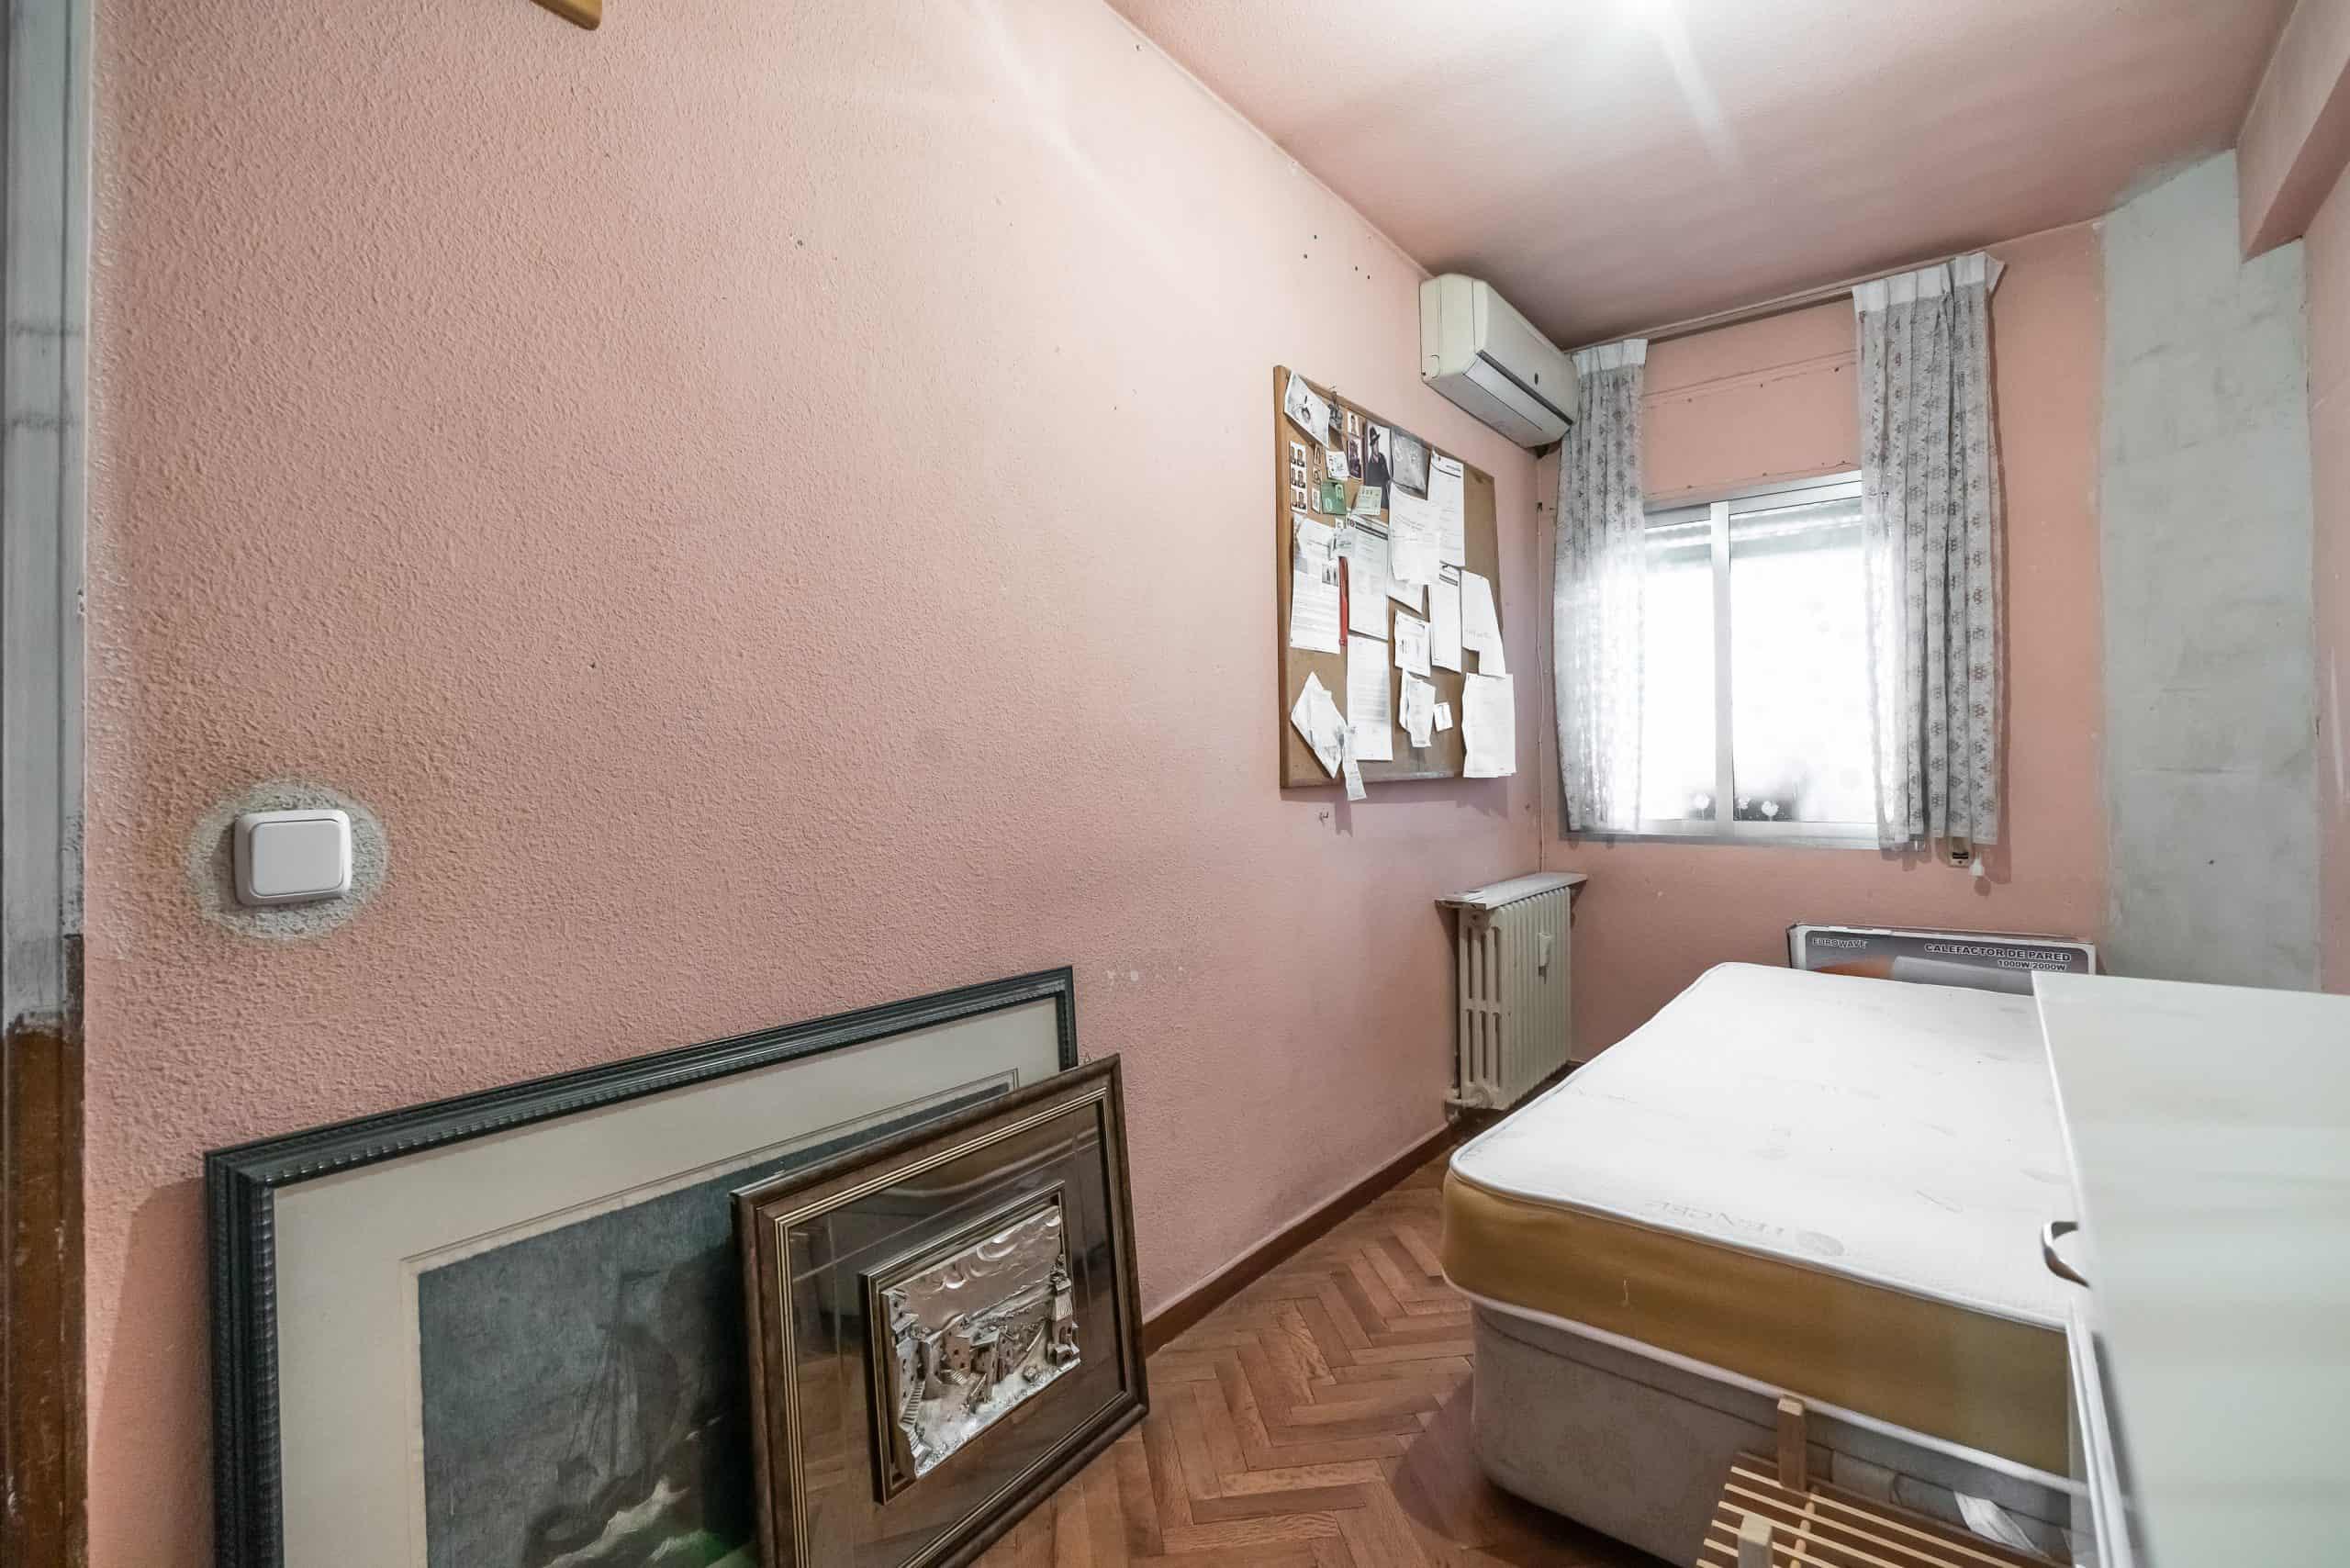 Agencia Inmobiliaria de Madrid-FUTUROCASA-calle Alcala- dormitorio 2.1